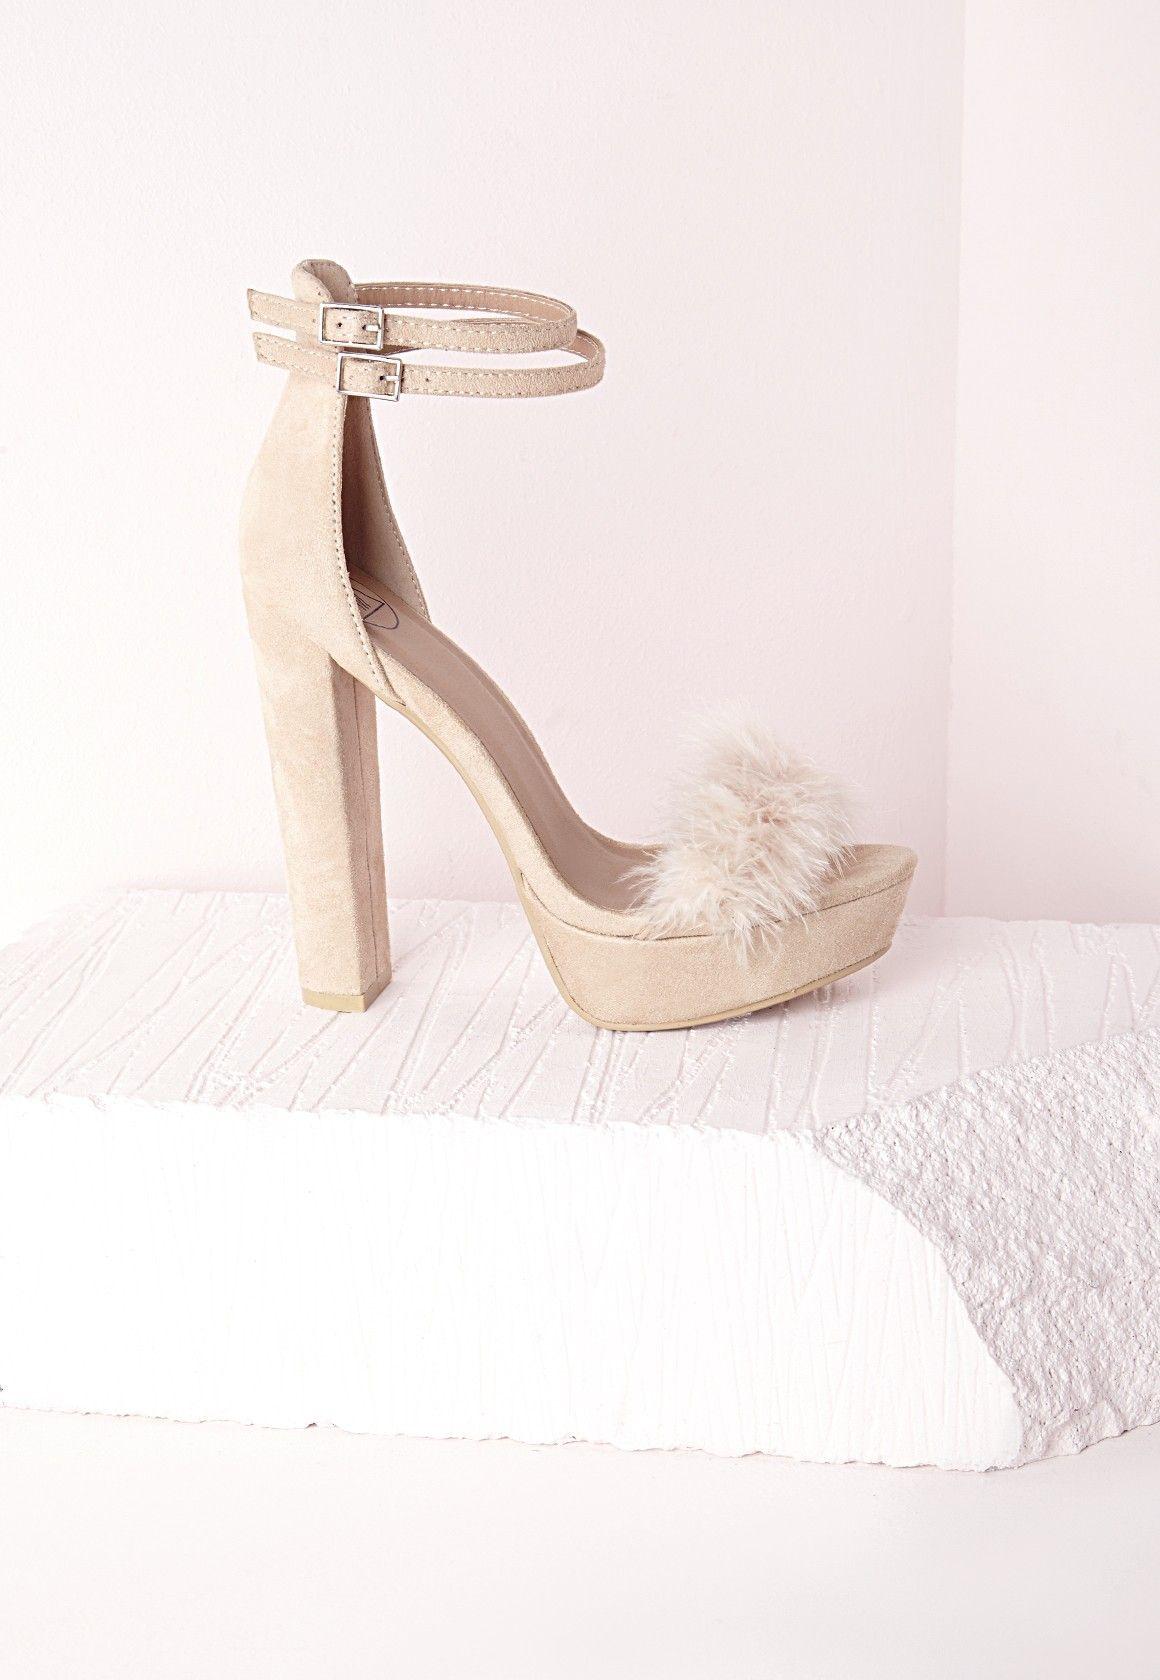 622fc9eff Fur Trim 70's Platform Sandals Cream - Shoes - High Heels - Missguided